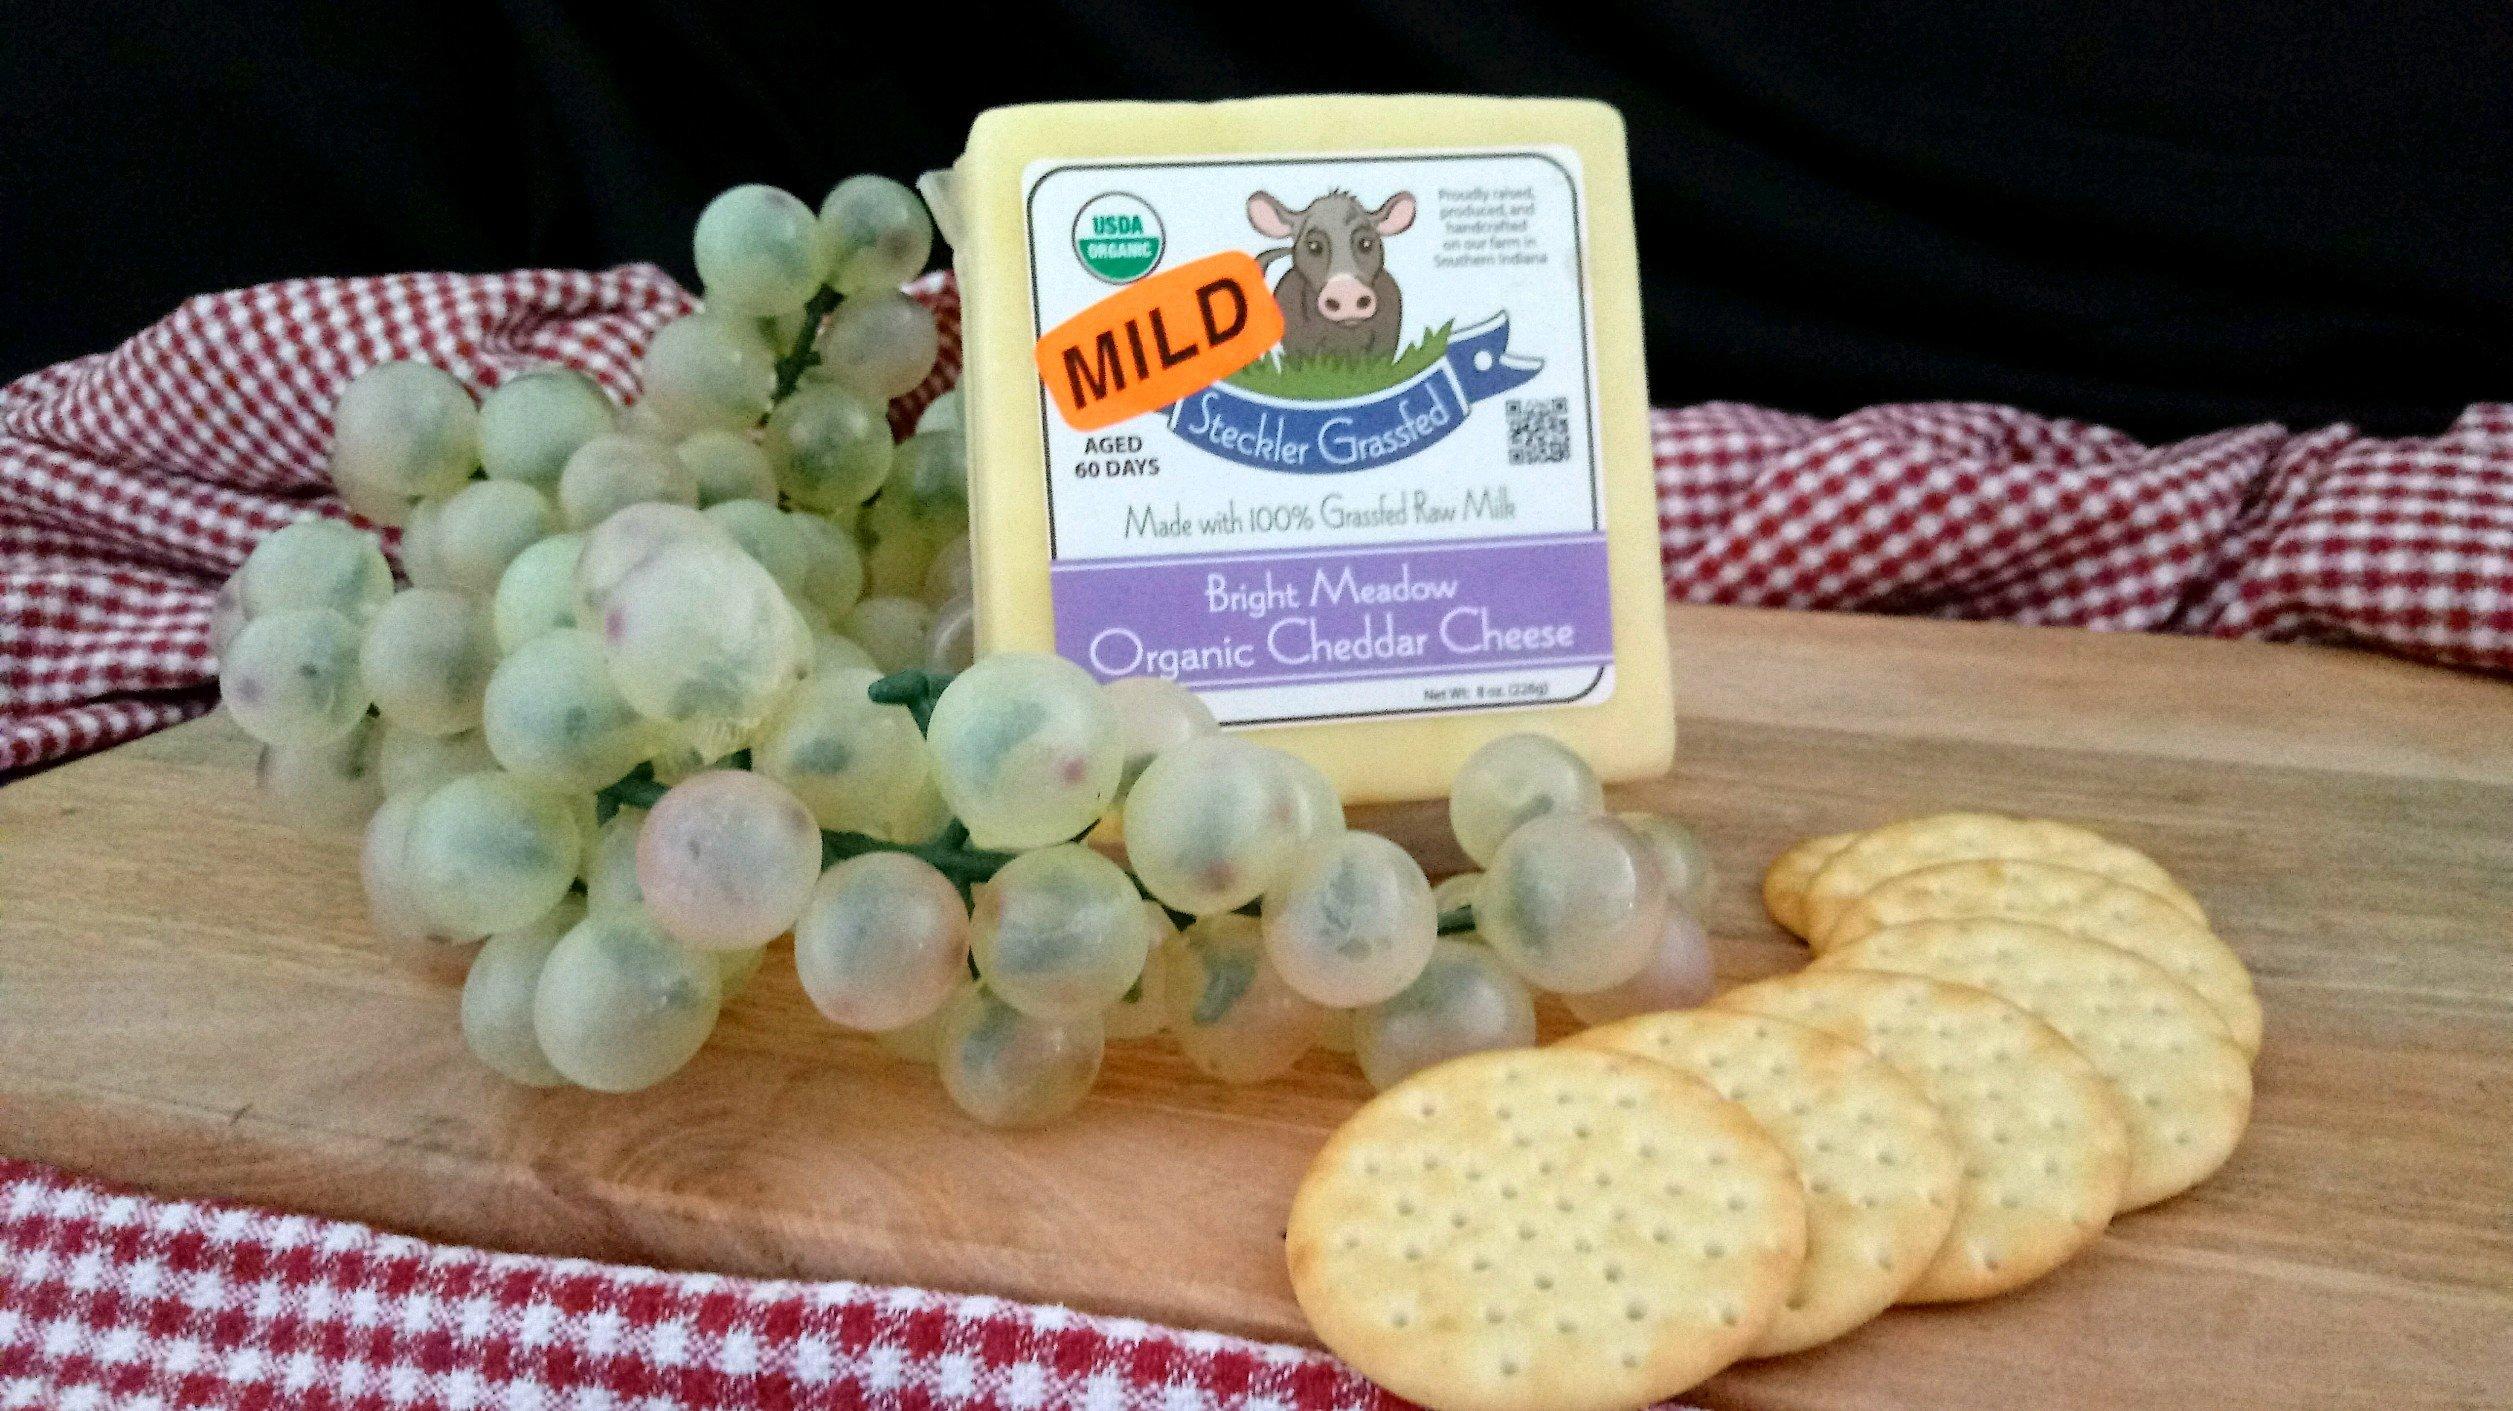 Bright Meadow Mild Cheddar Cheese C-CM18-0008